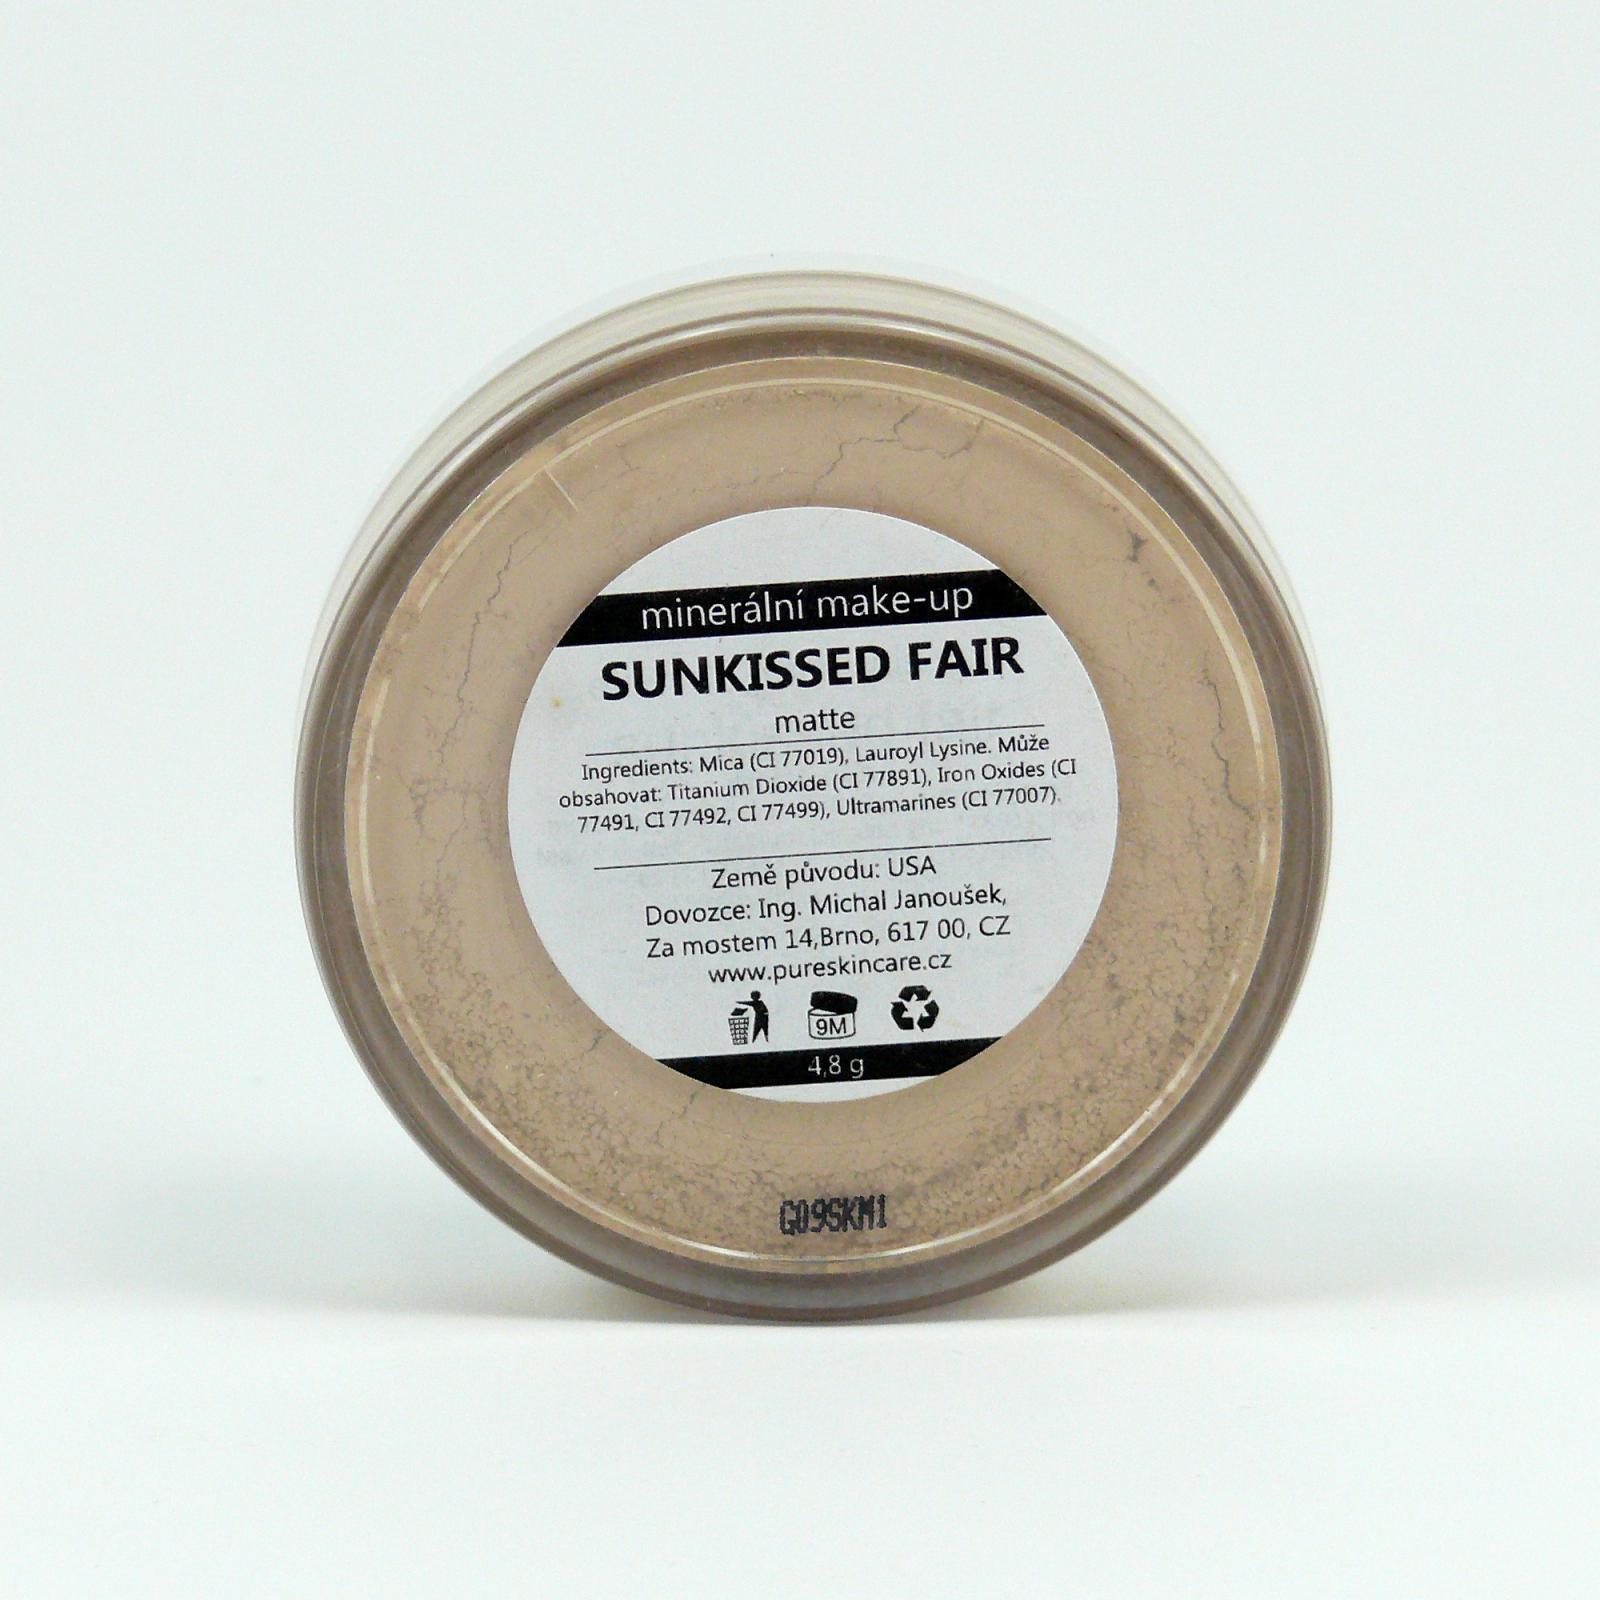 Everyday Minerals Minerální make-up Sunkissed Fair, Matte 4,8 g